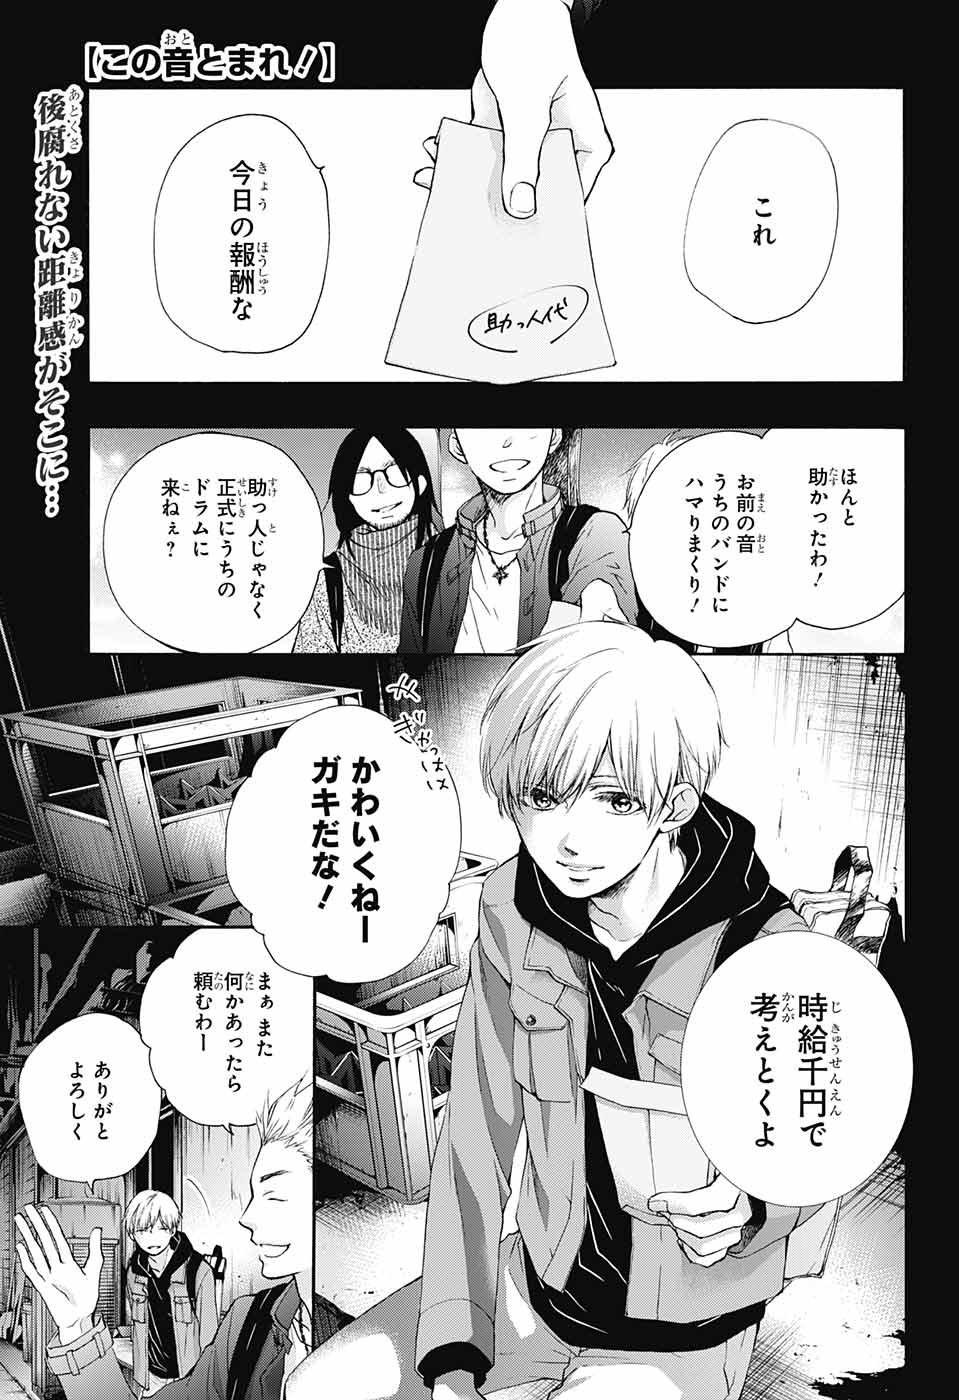 Kono-Oto-Tomare! Chapter 073 Page 1